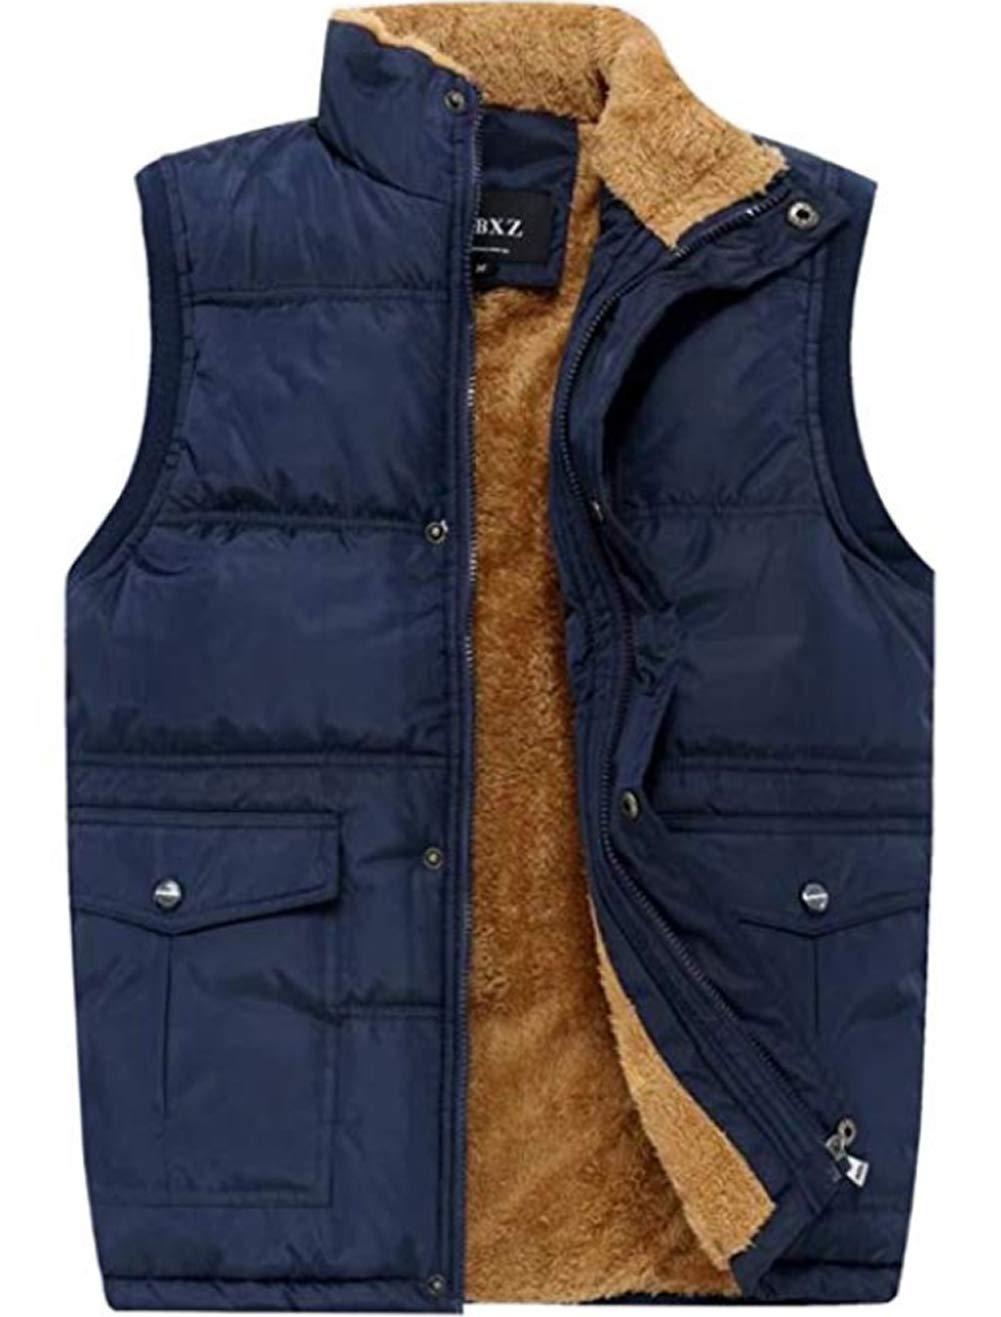 XinYangNi Men's Winter Warm Outdoor Padded Puffer Lightweight Vest Thick Fleece Lined Sleeveless Jacket Blue US XL/Asia 5XL by XinYangNi